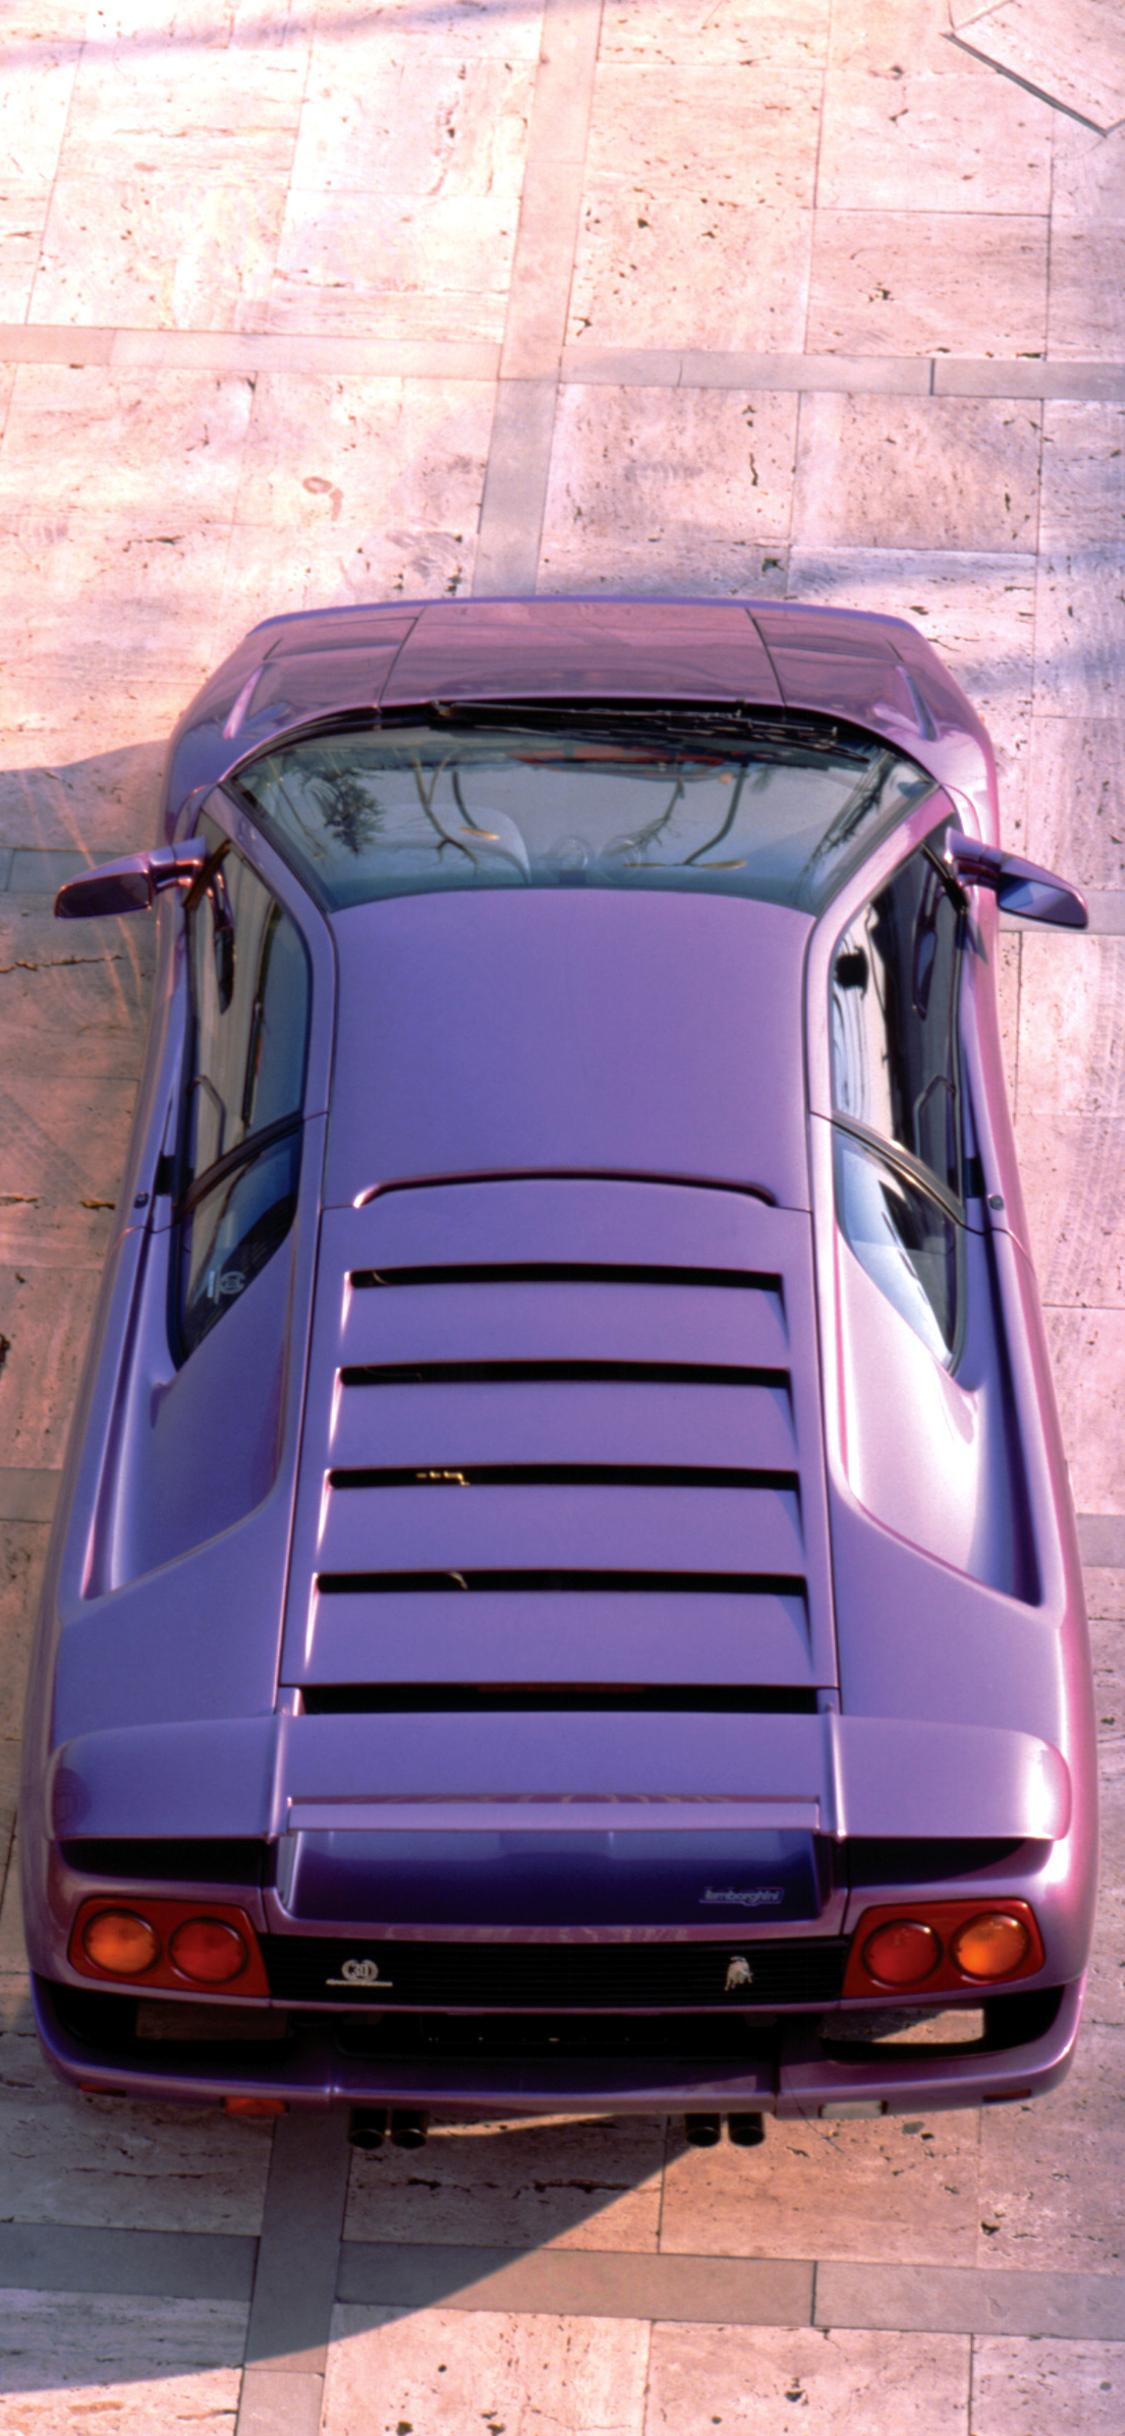 1125x2436 Lamborghini Diablo Se30 Iphone Xs Iphone 10 Iphone X Hd 4k